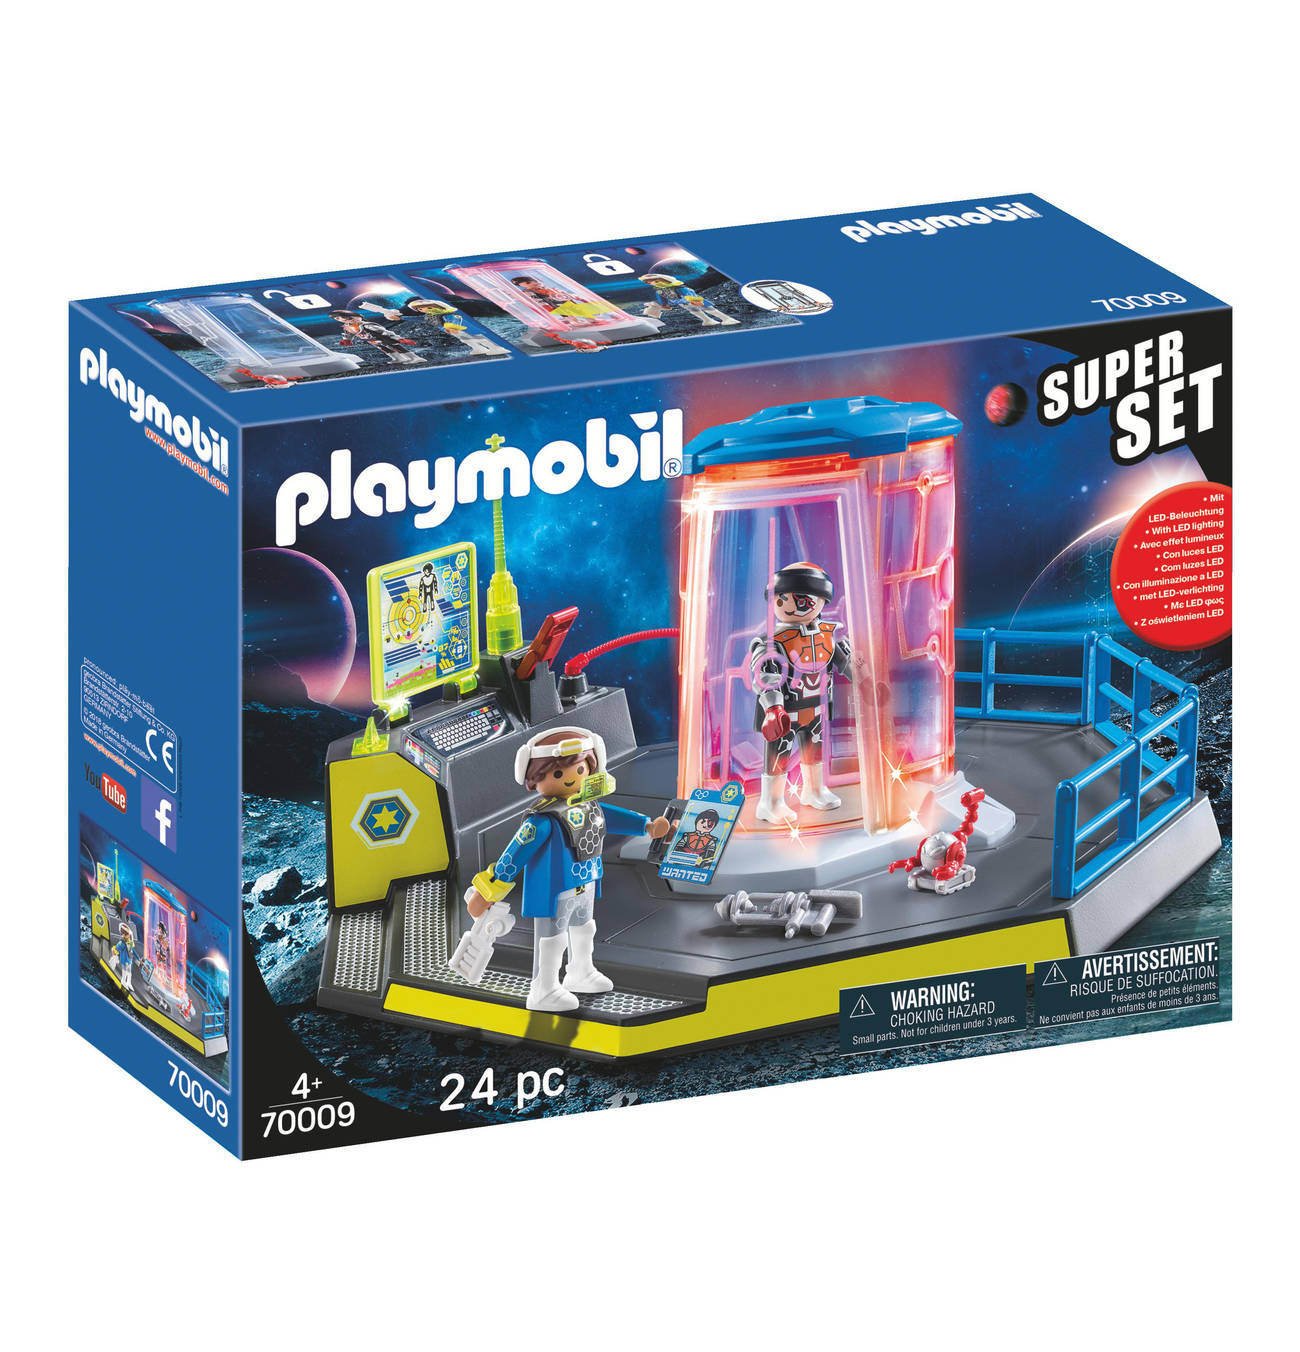 Superset Galaxy Police Gefangnis 70009 Playmobil Gefangniszelle Schwerverbrecher